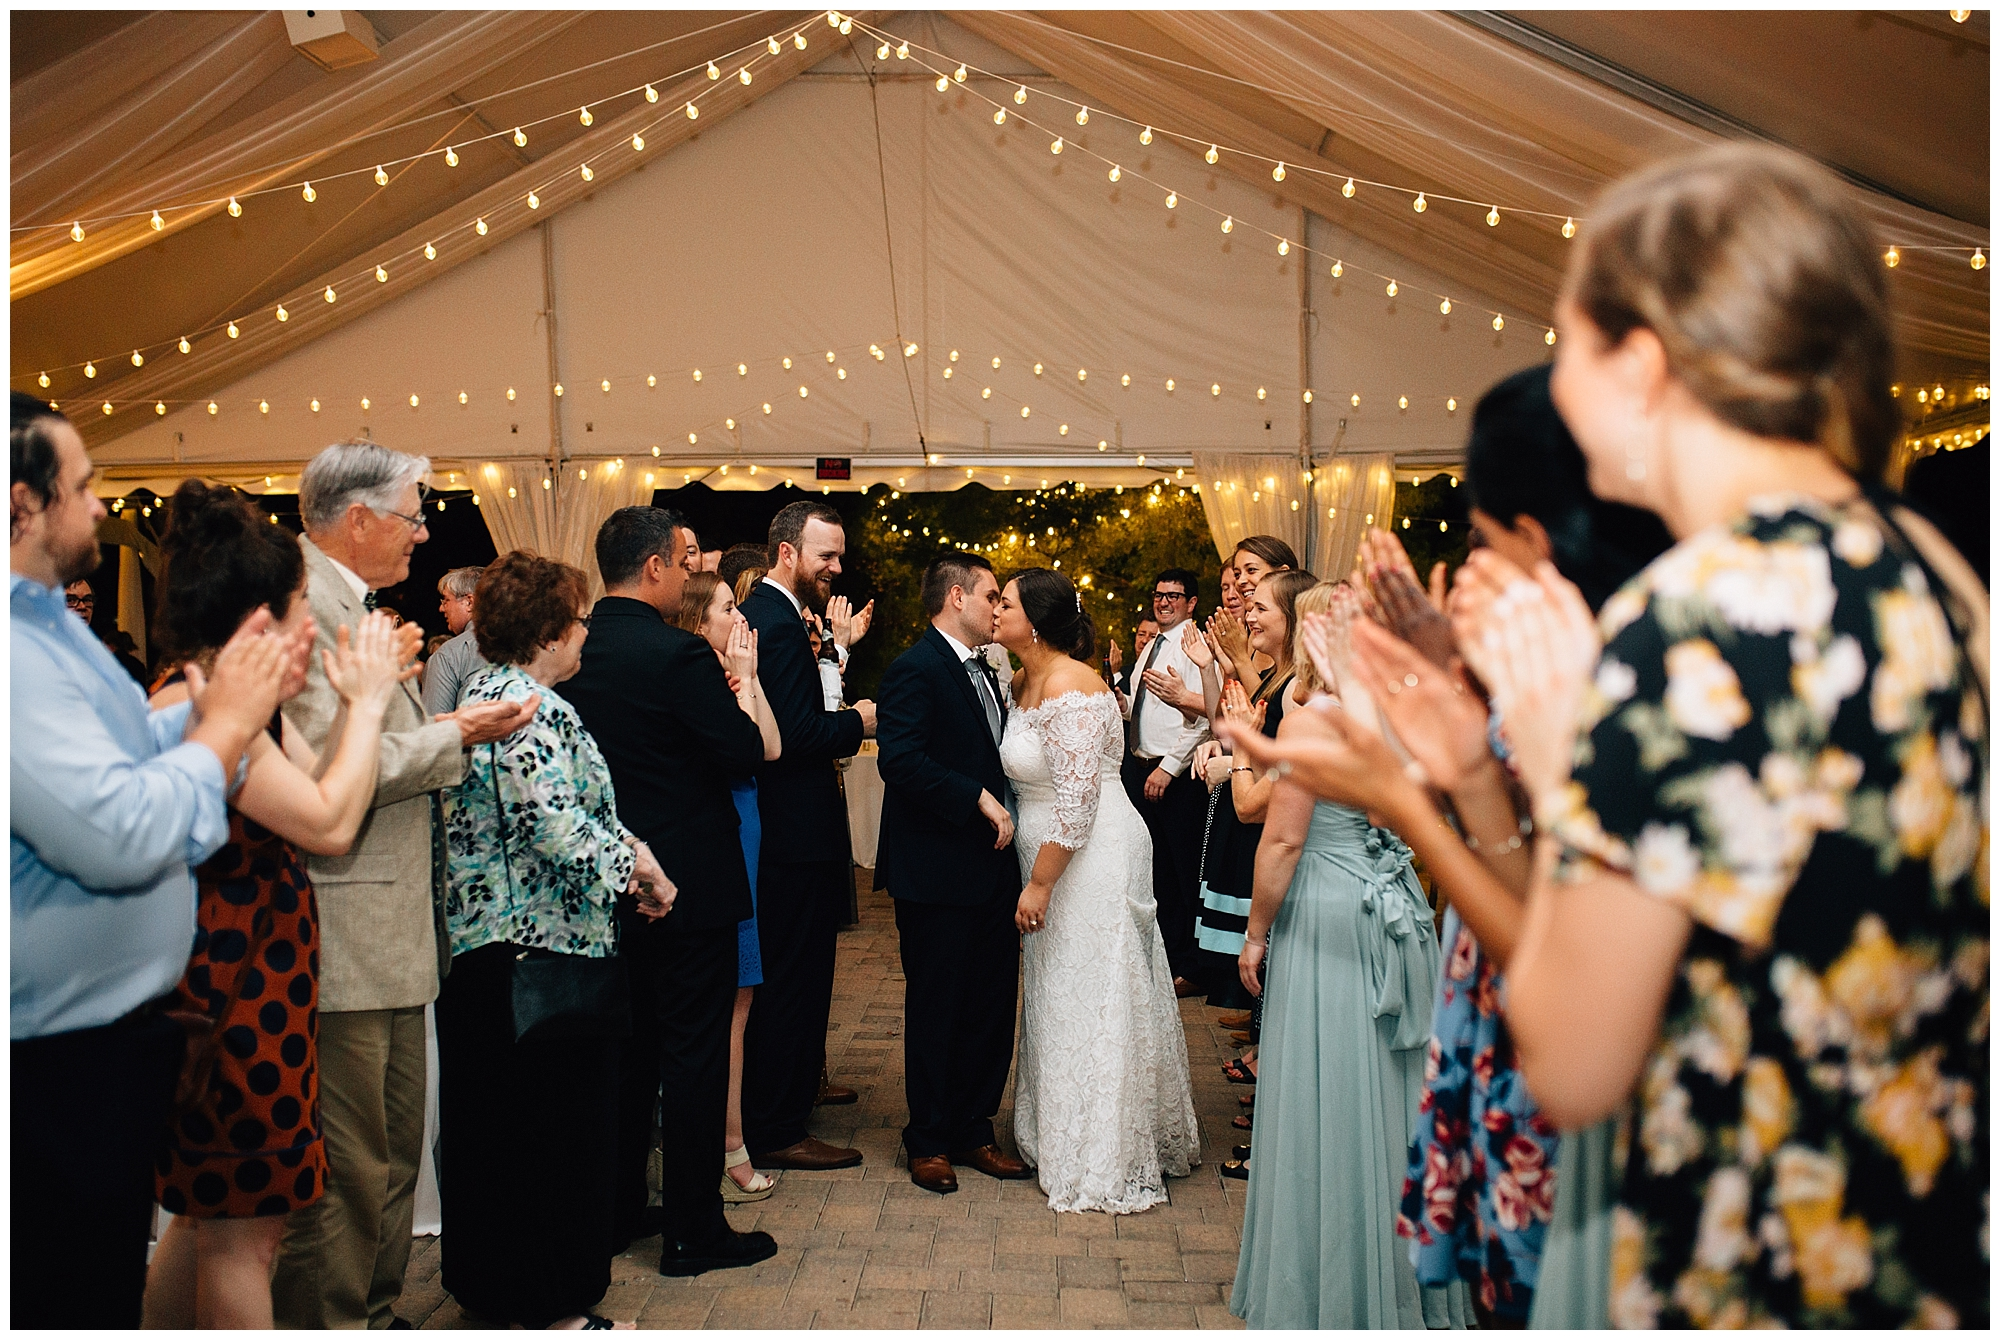 Oaks-at-salem-wedding-apex-photography-125.jpg